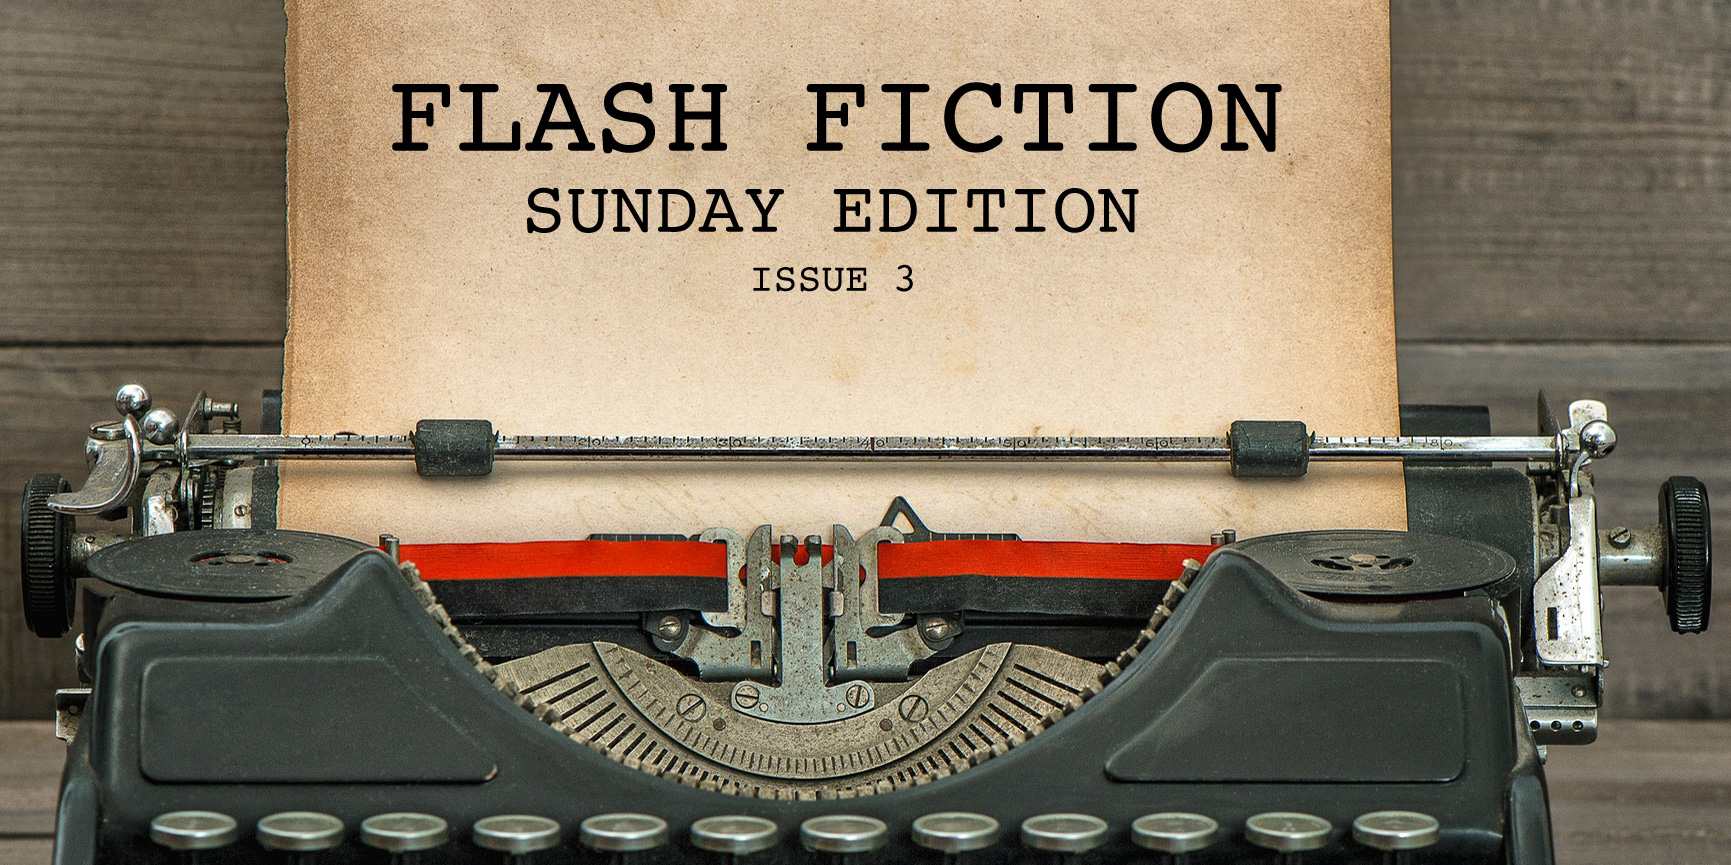 Flash Fiction Sunday Edition - Issue 3